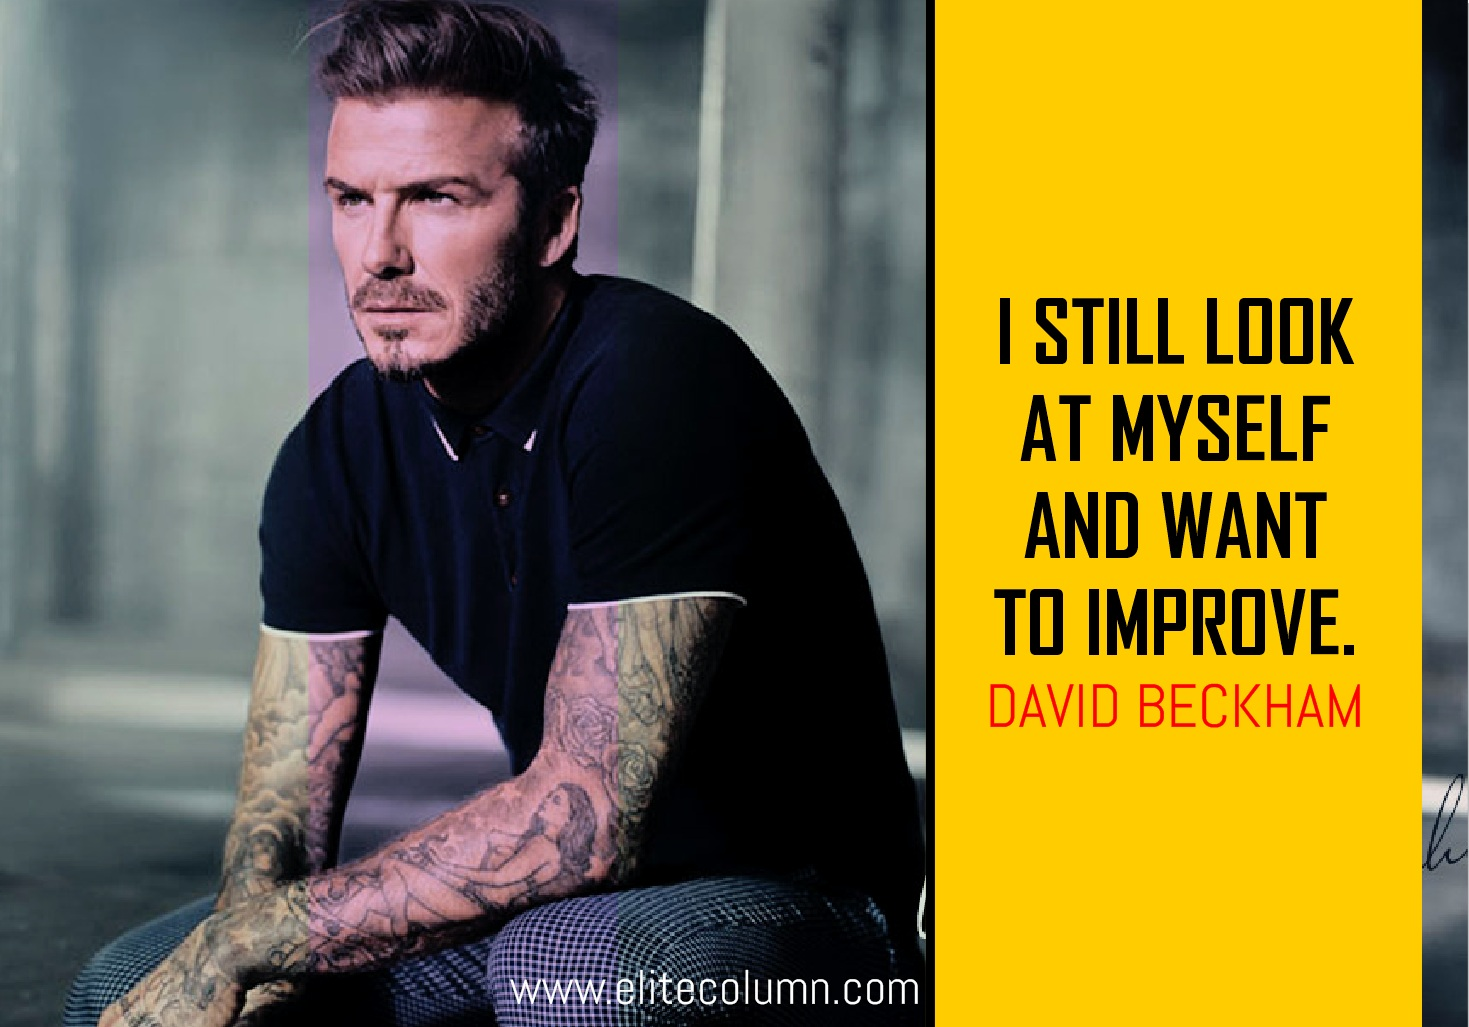 David Beckham Quotes 5 | EliteColumn